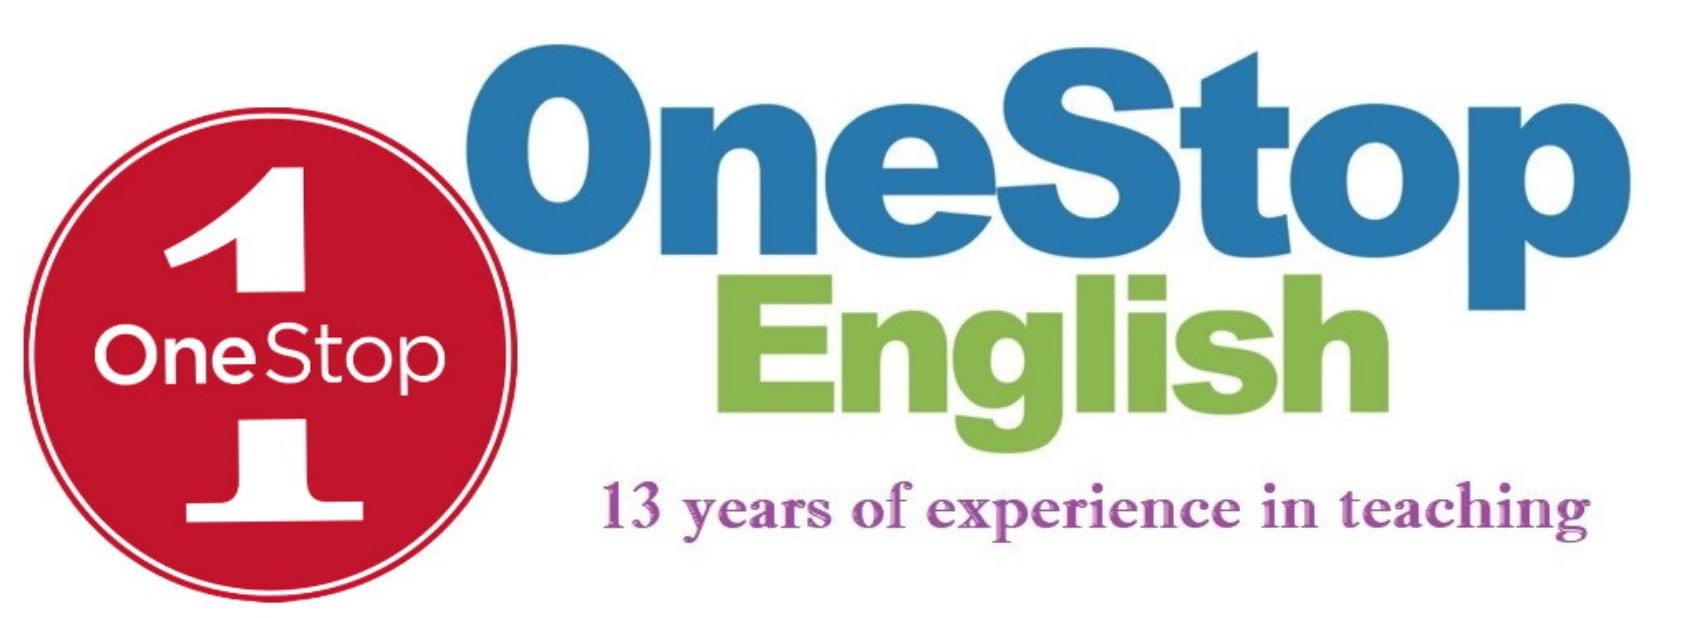 Onestop English